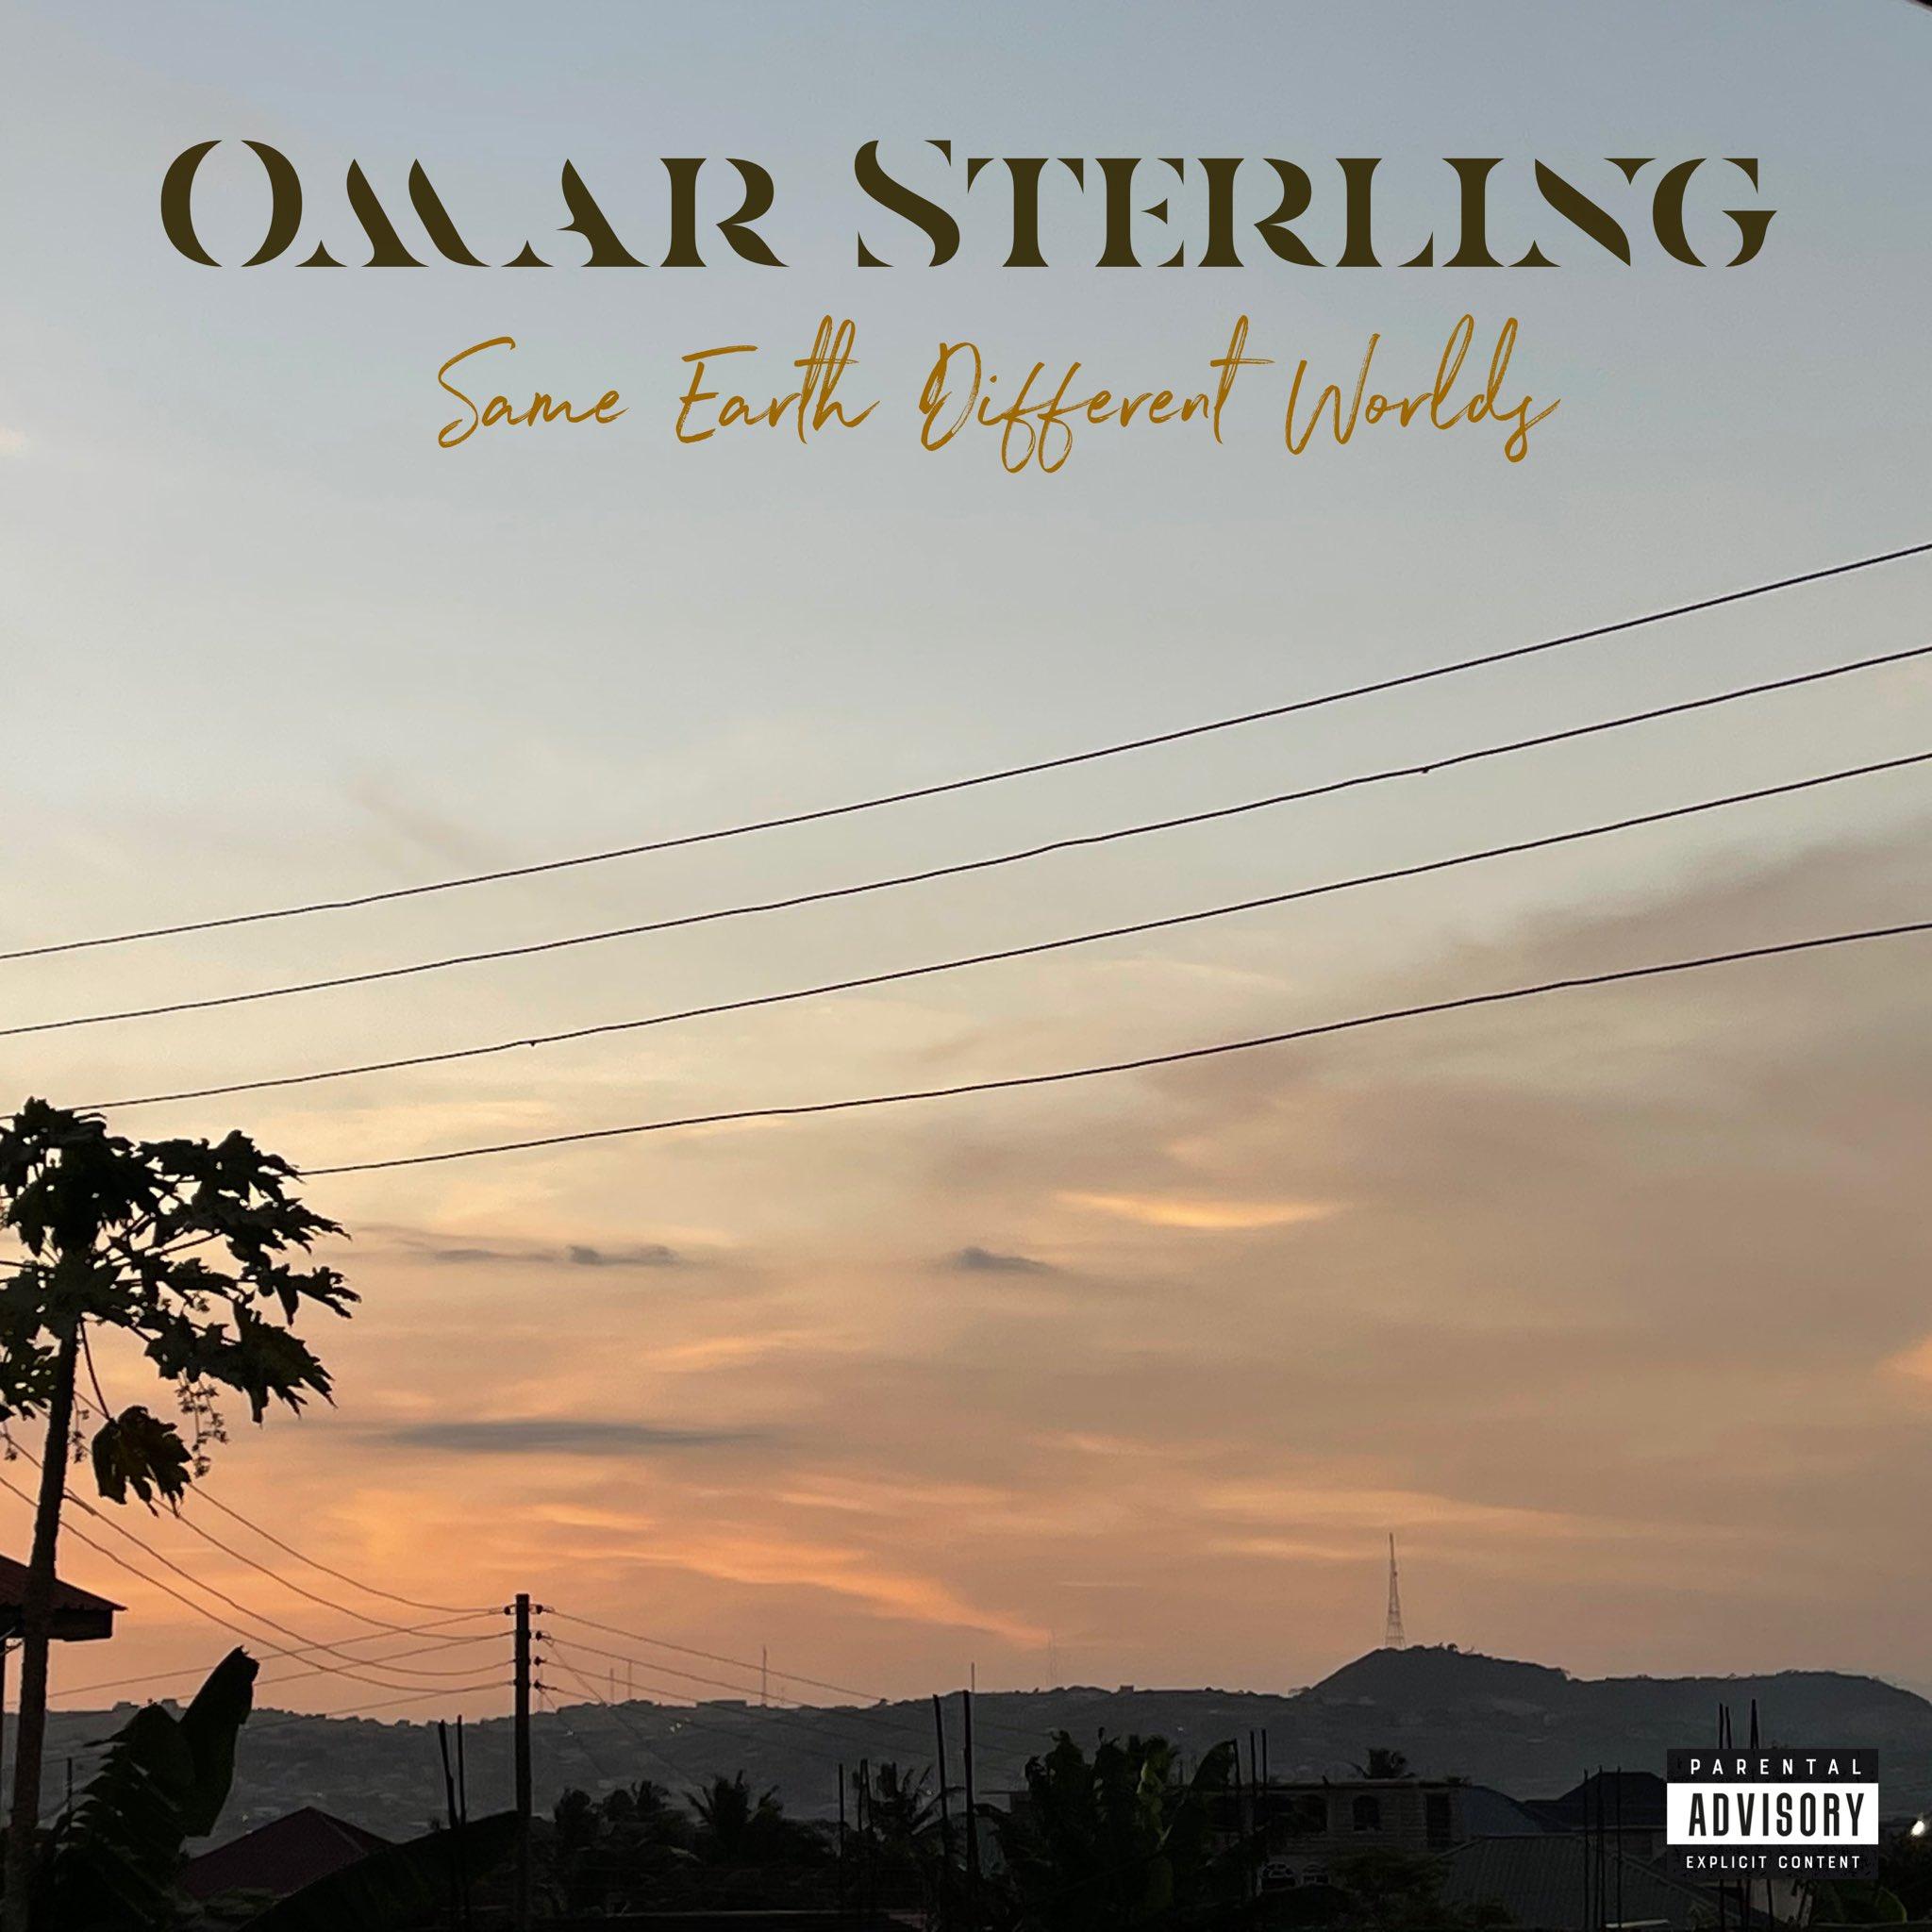 Omar Sterling - Same Earth Different Worlds Album